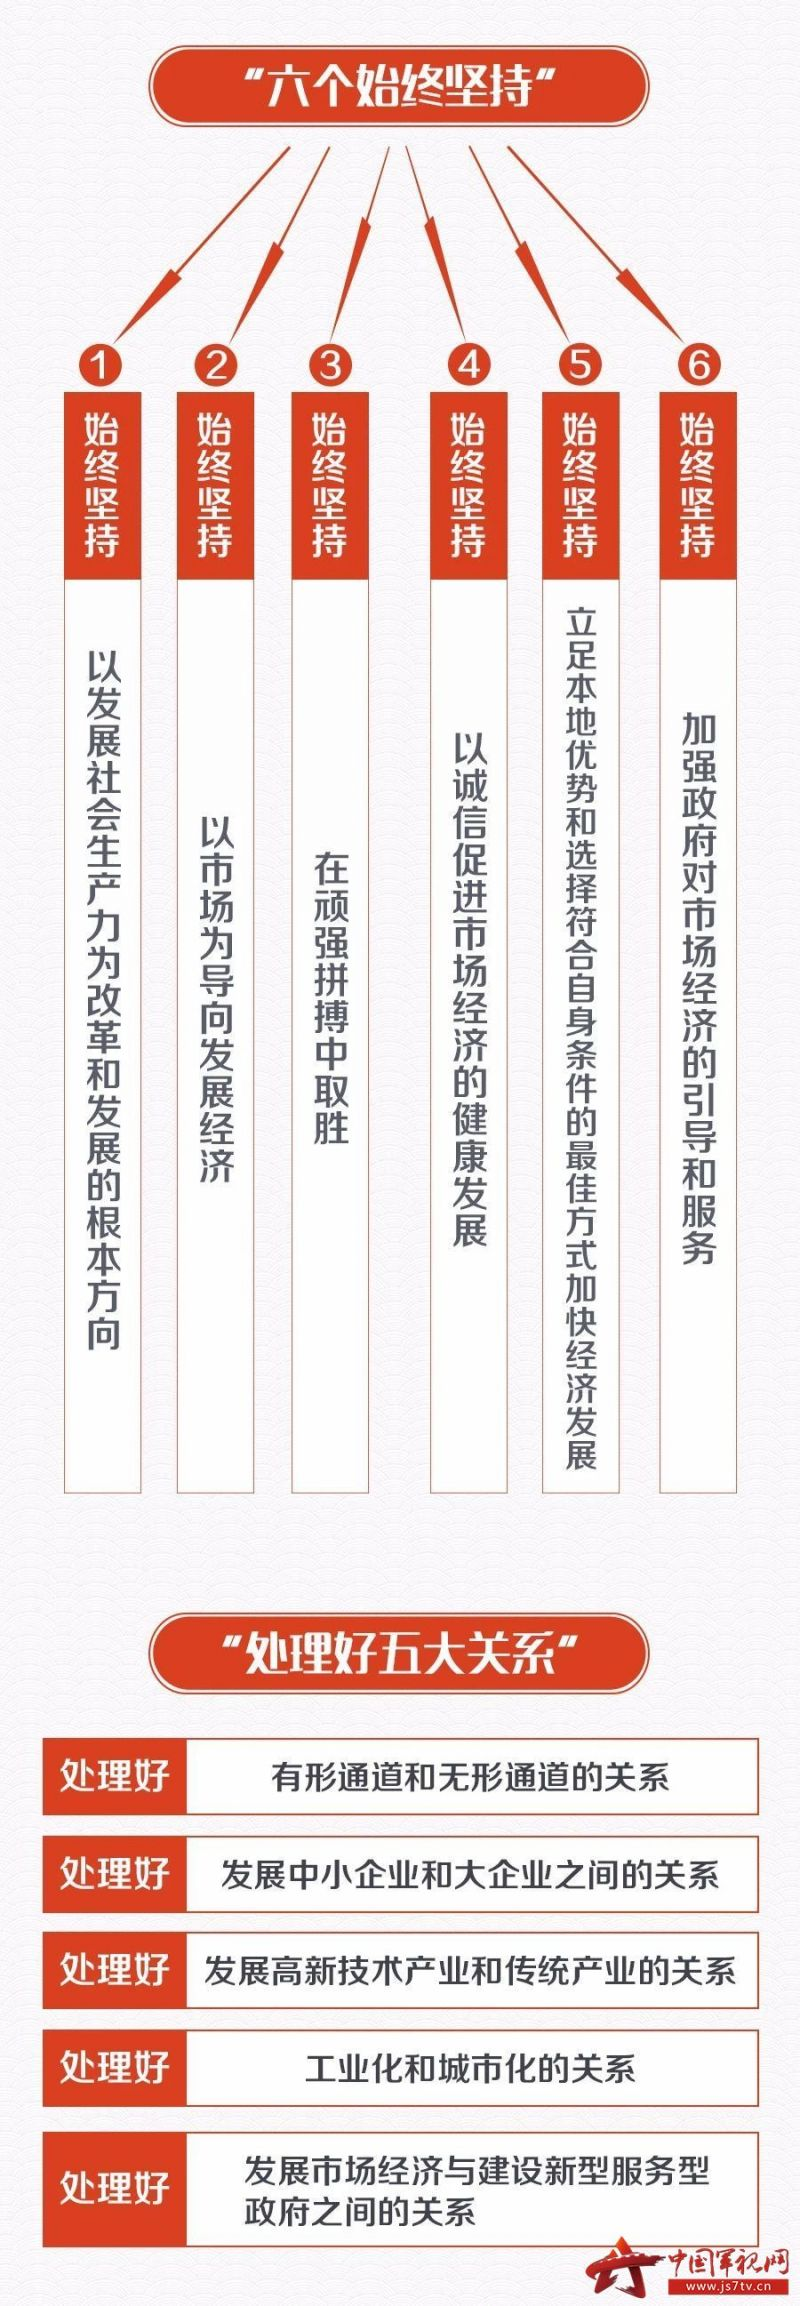 http://files.js7tv.cn/www/images/2018-07/12/1531365093954236_big.jpg